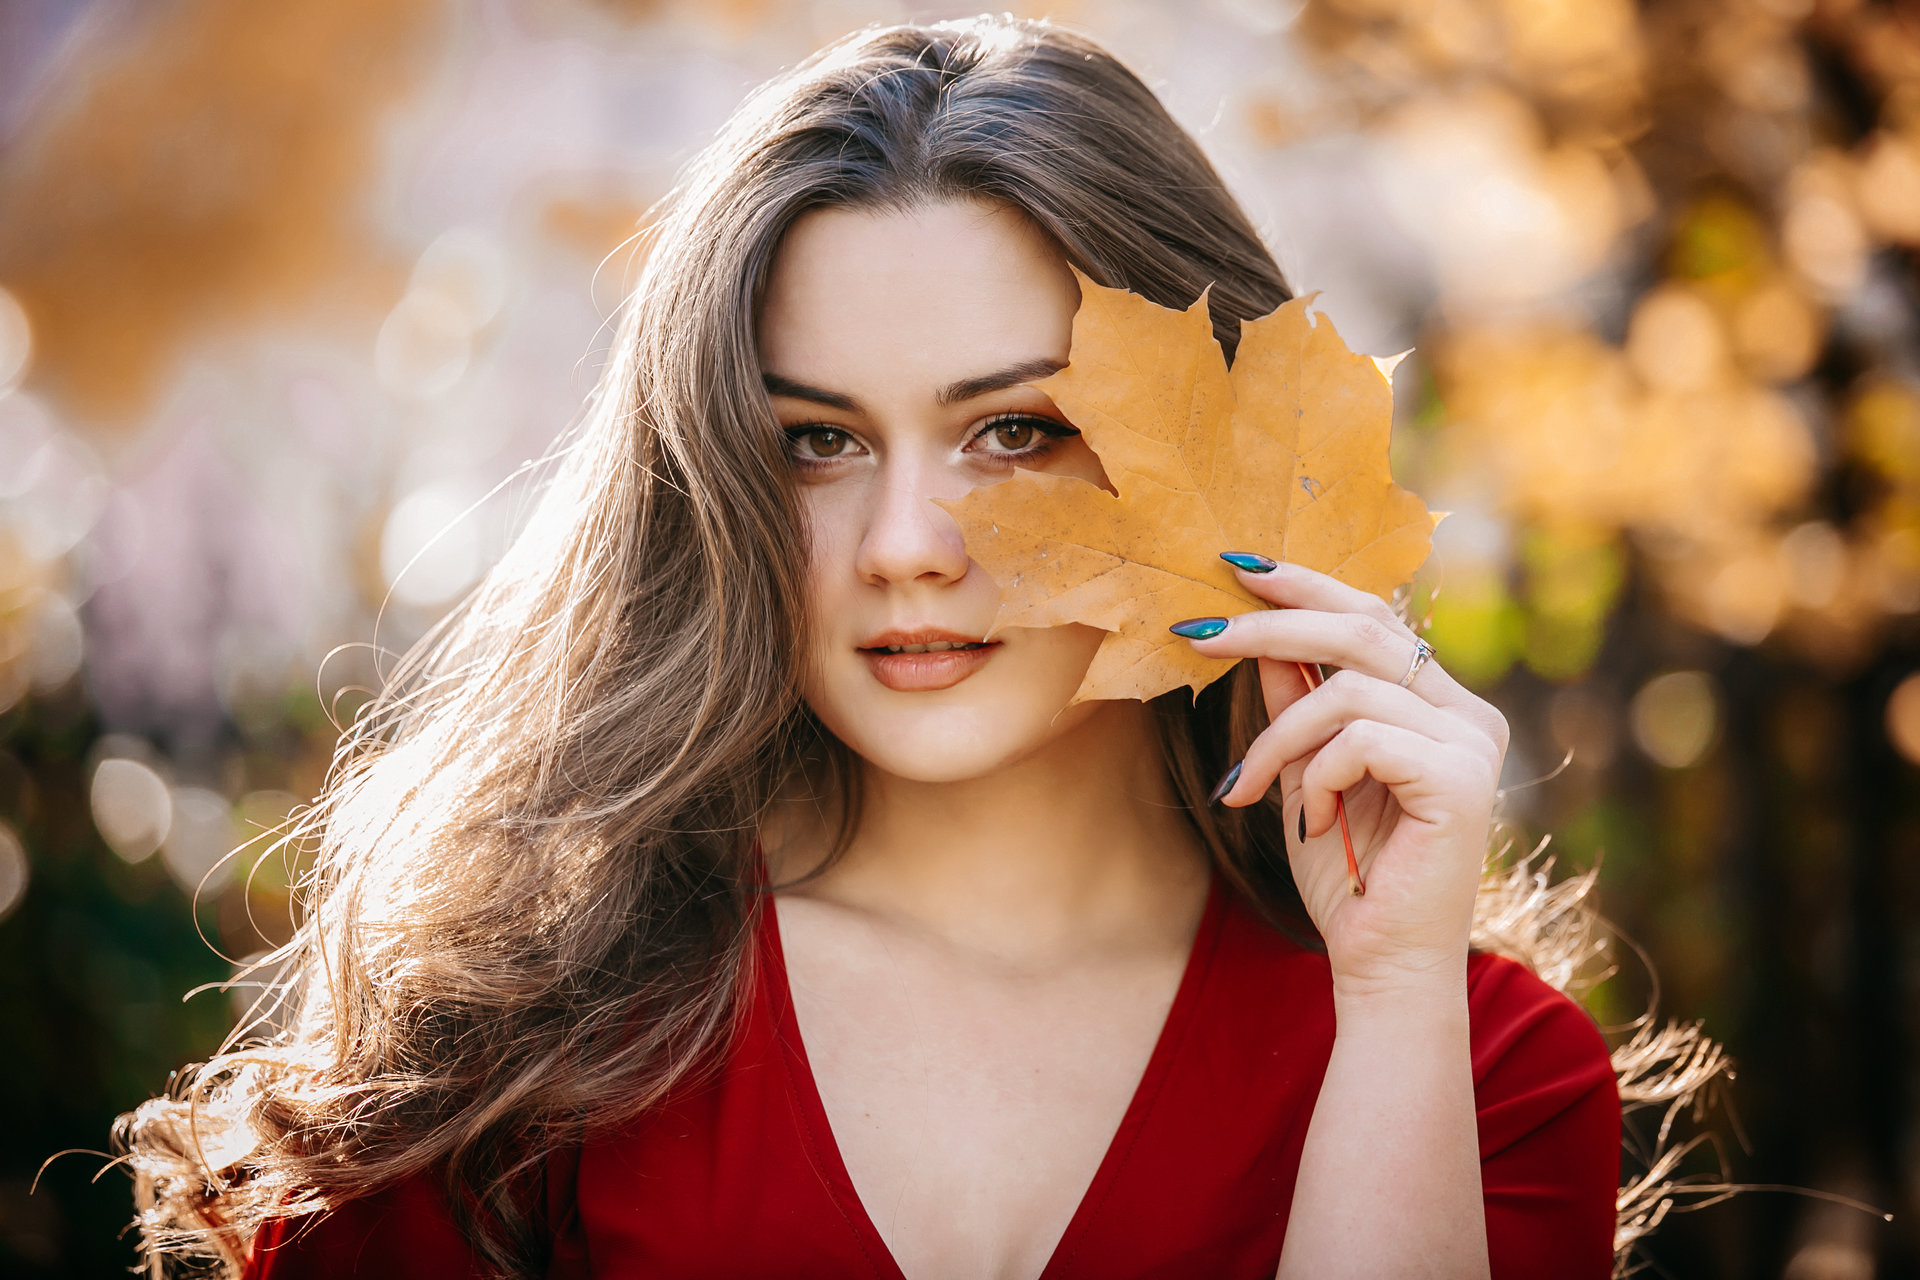 Photo in Portrait | Author aleksandar petrov - sandesko | PHOTO FORUM